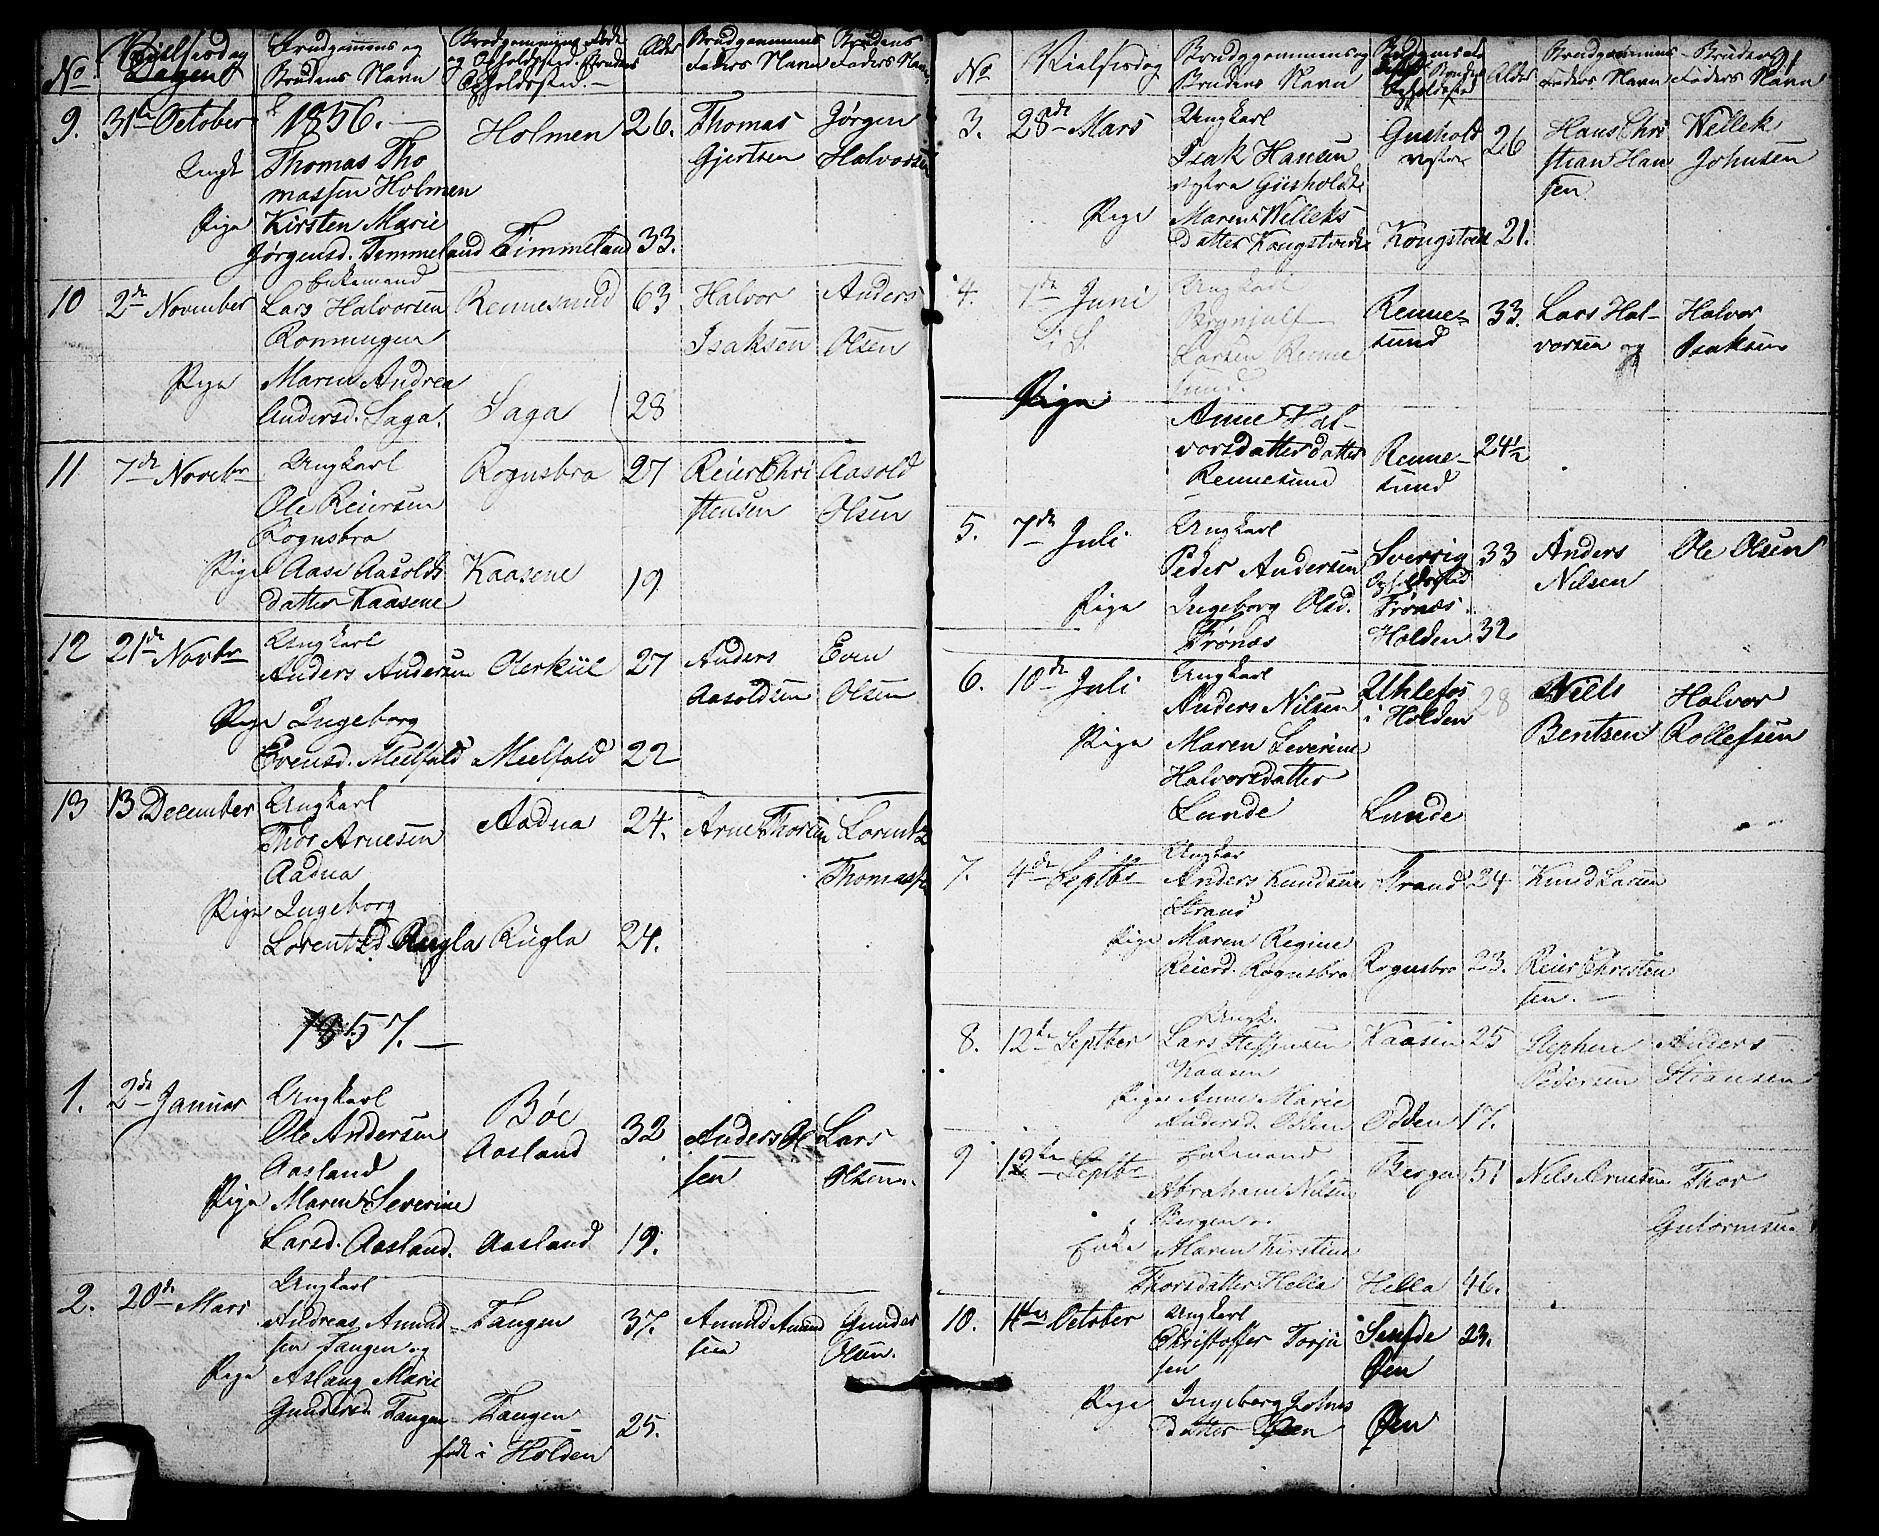 SAKO, Solum kirkebøker, G/Gb/L0001: Klokkerbok nr. II 1, 1848-1859, s. 91